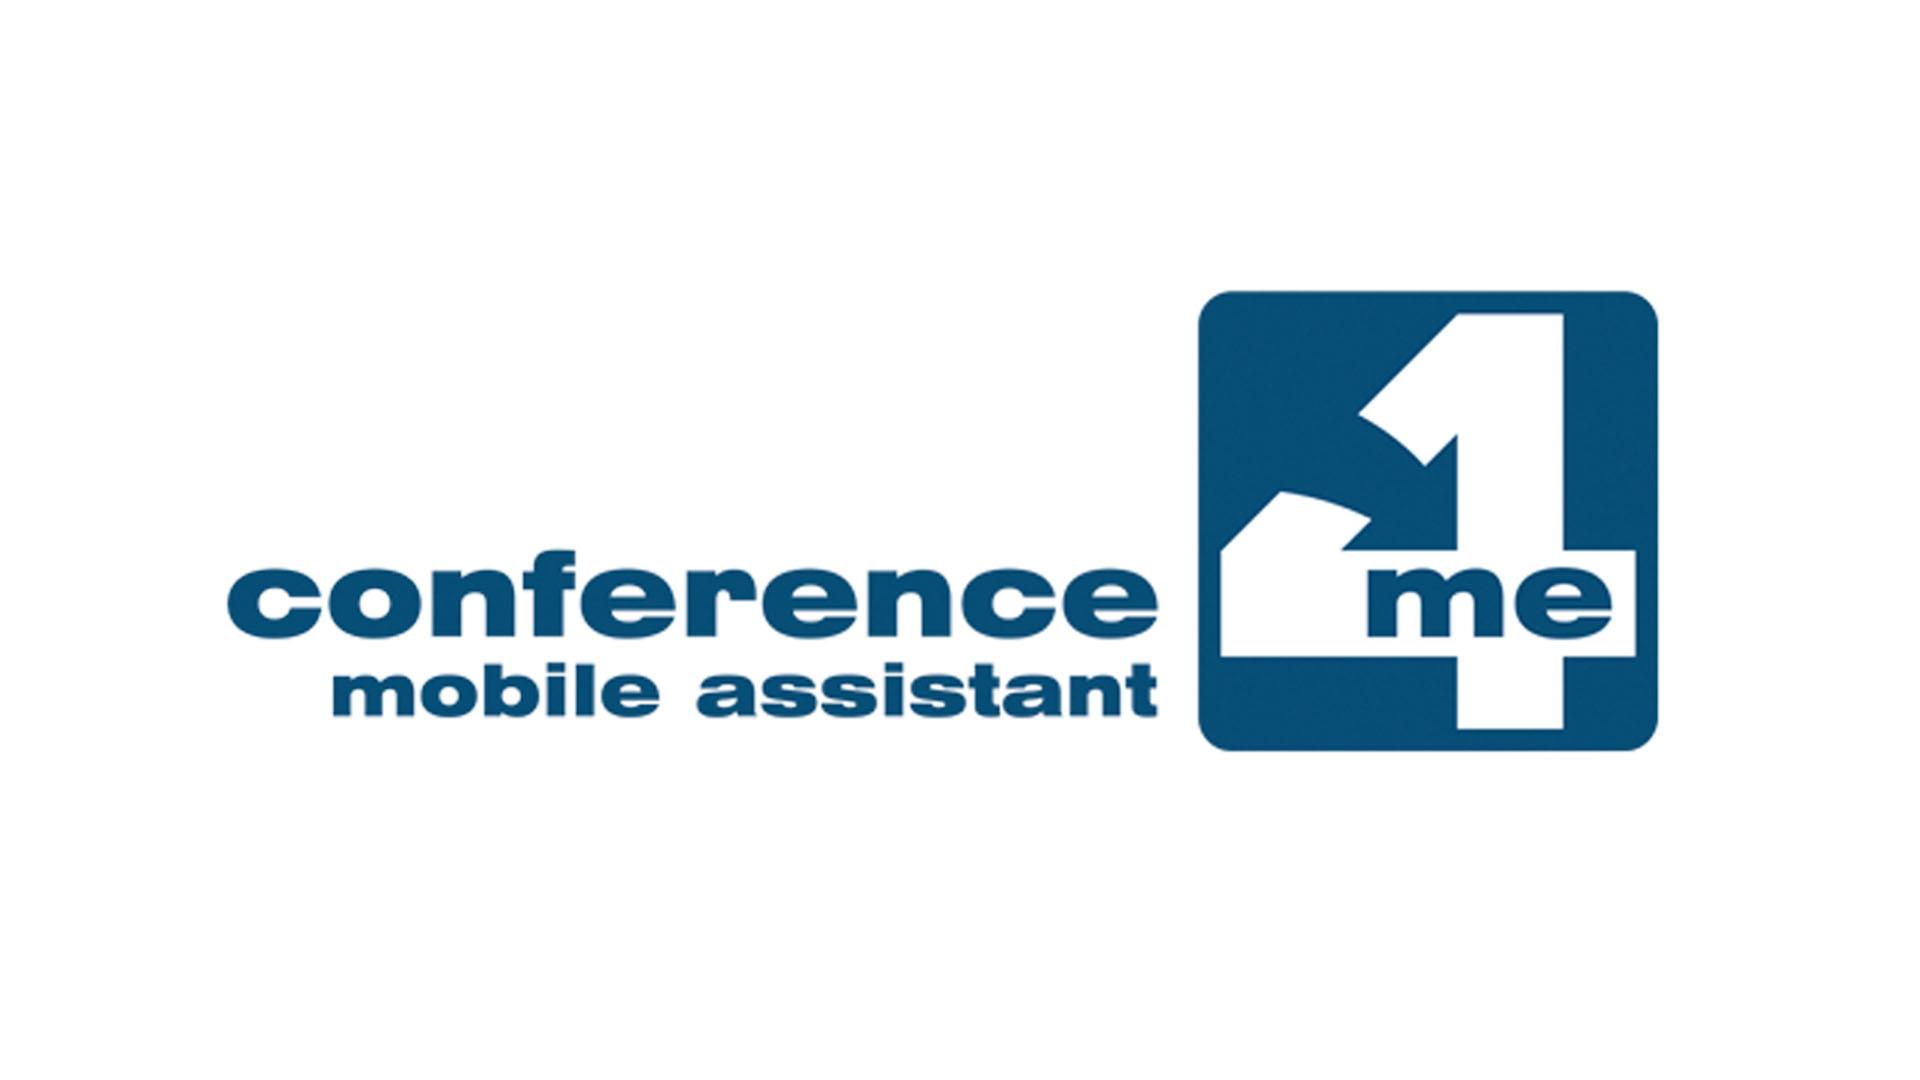 Conference4me w październiku 2017